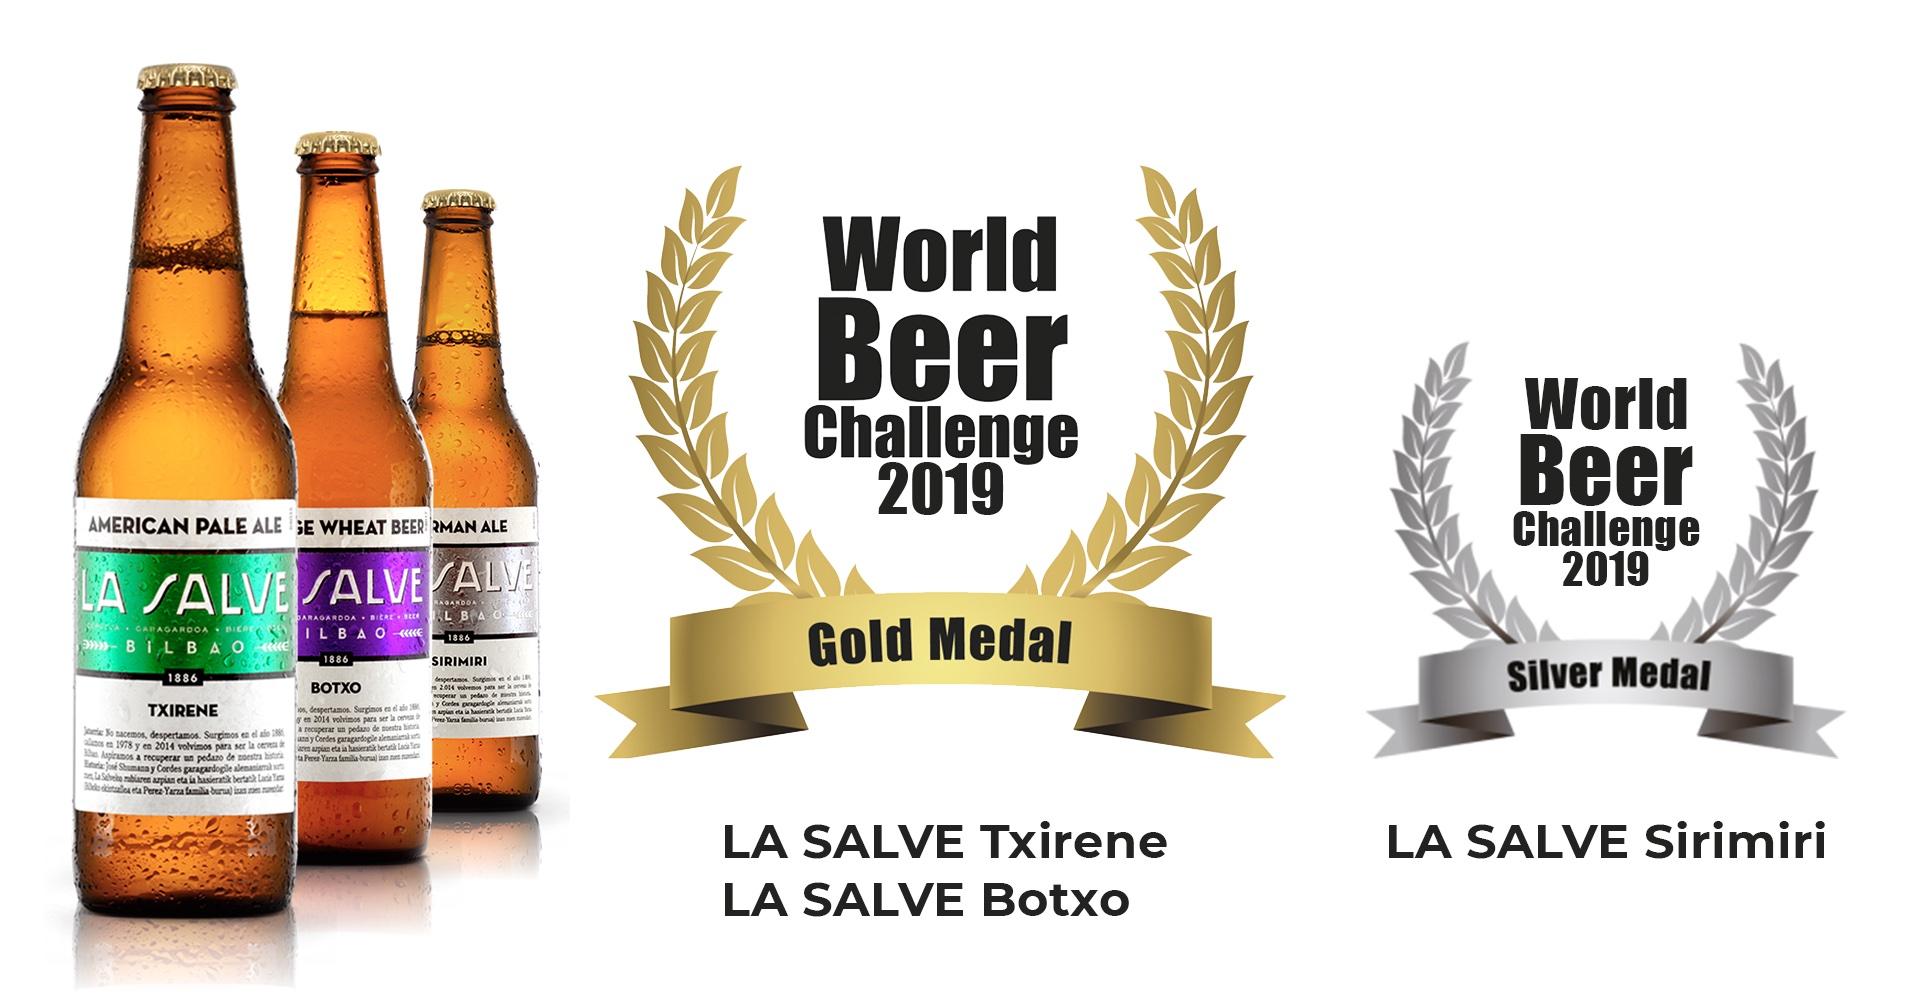 Cerveza La Salve Bilbao - Premios World Beer Challenge